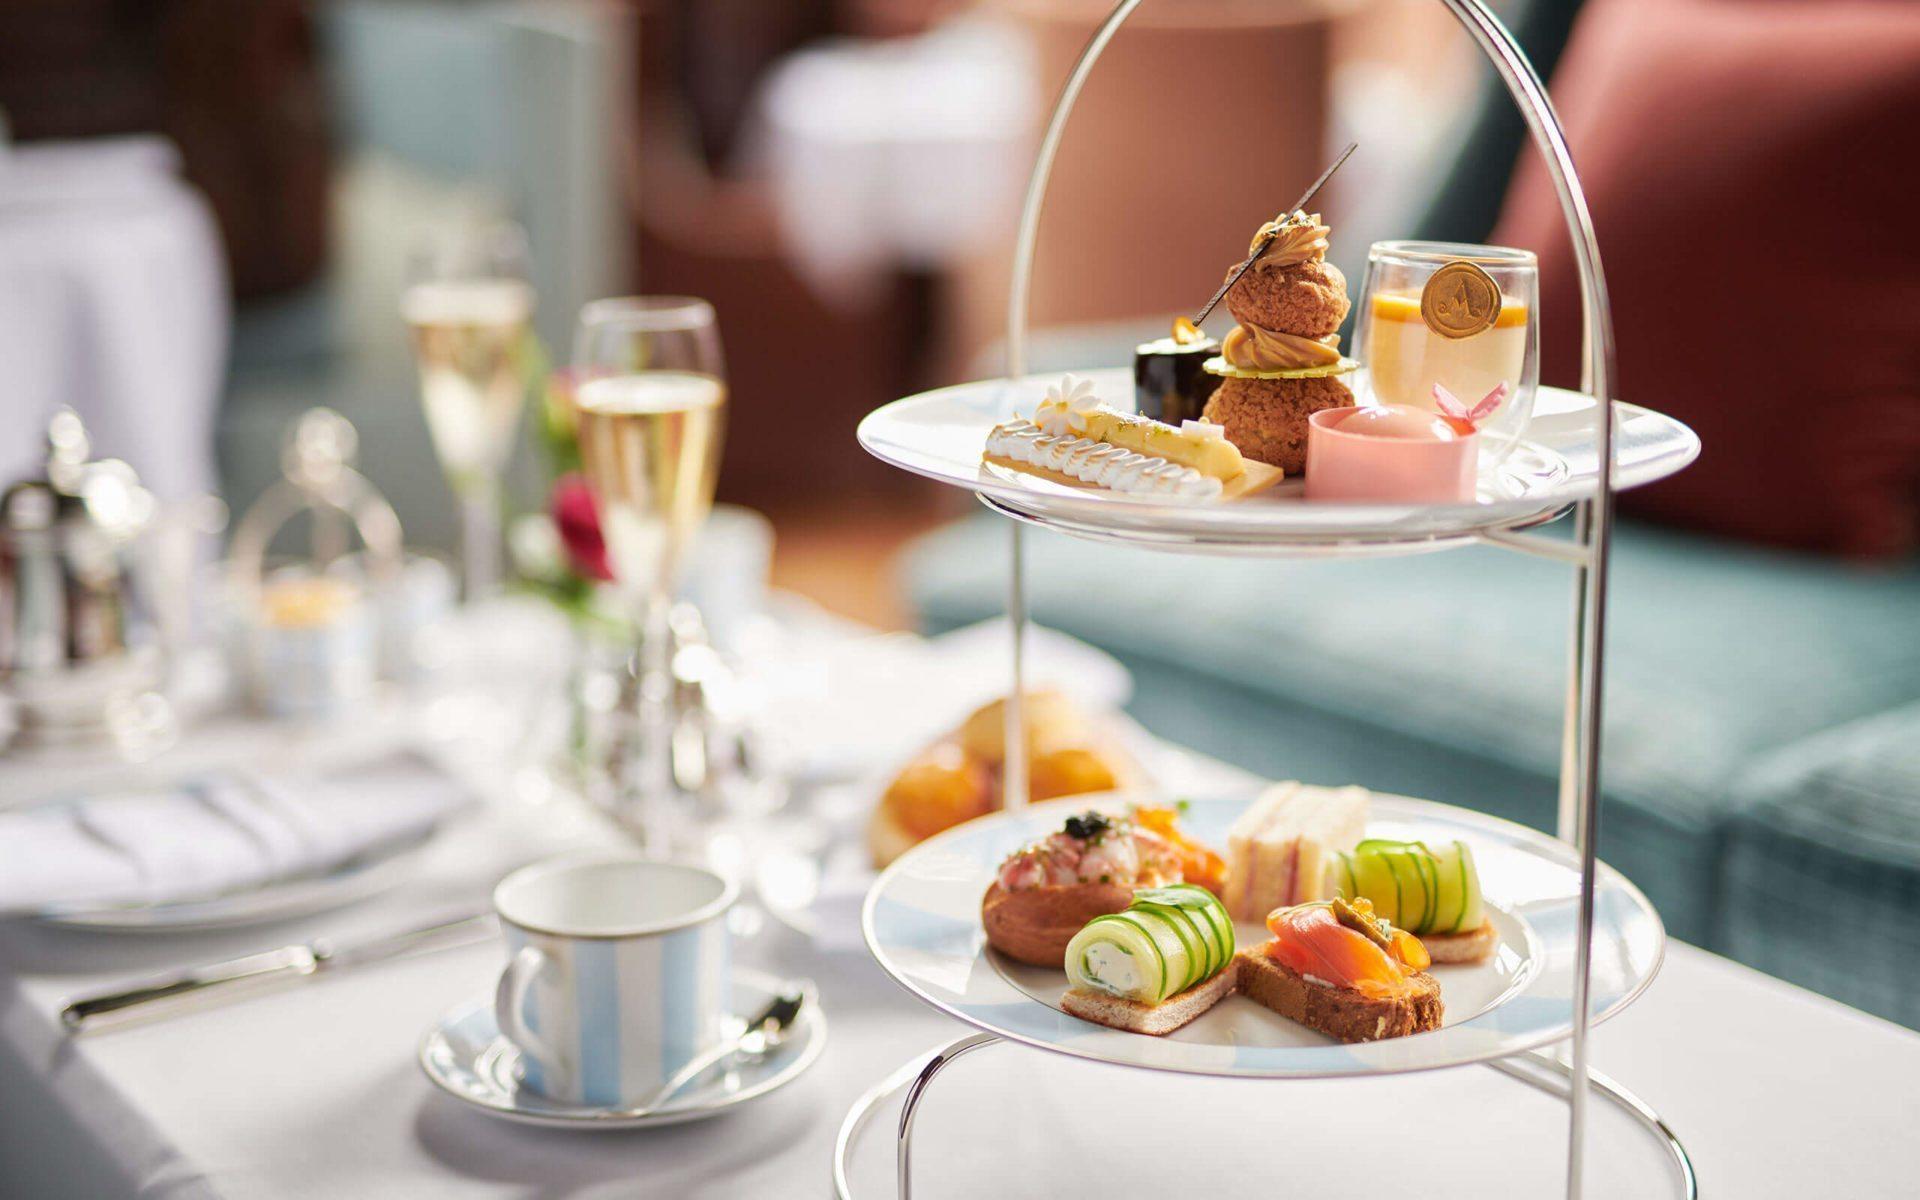 Adare Manor Hotel - Afternoon Tea